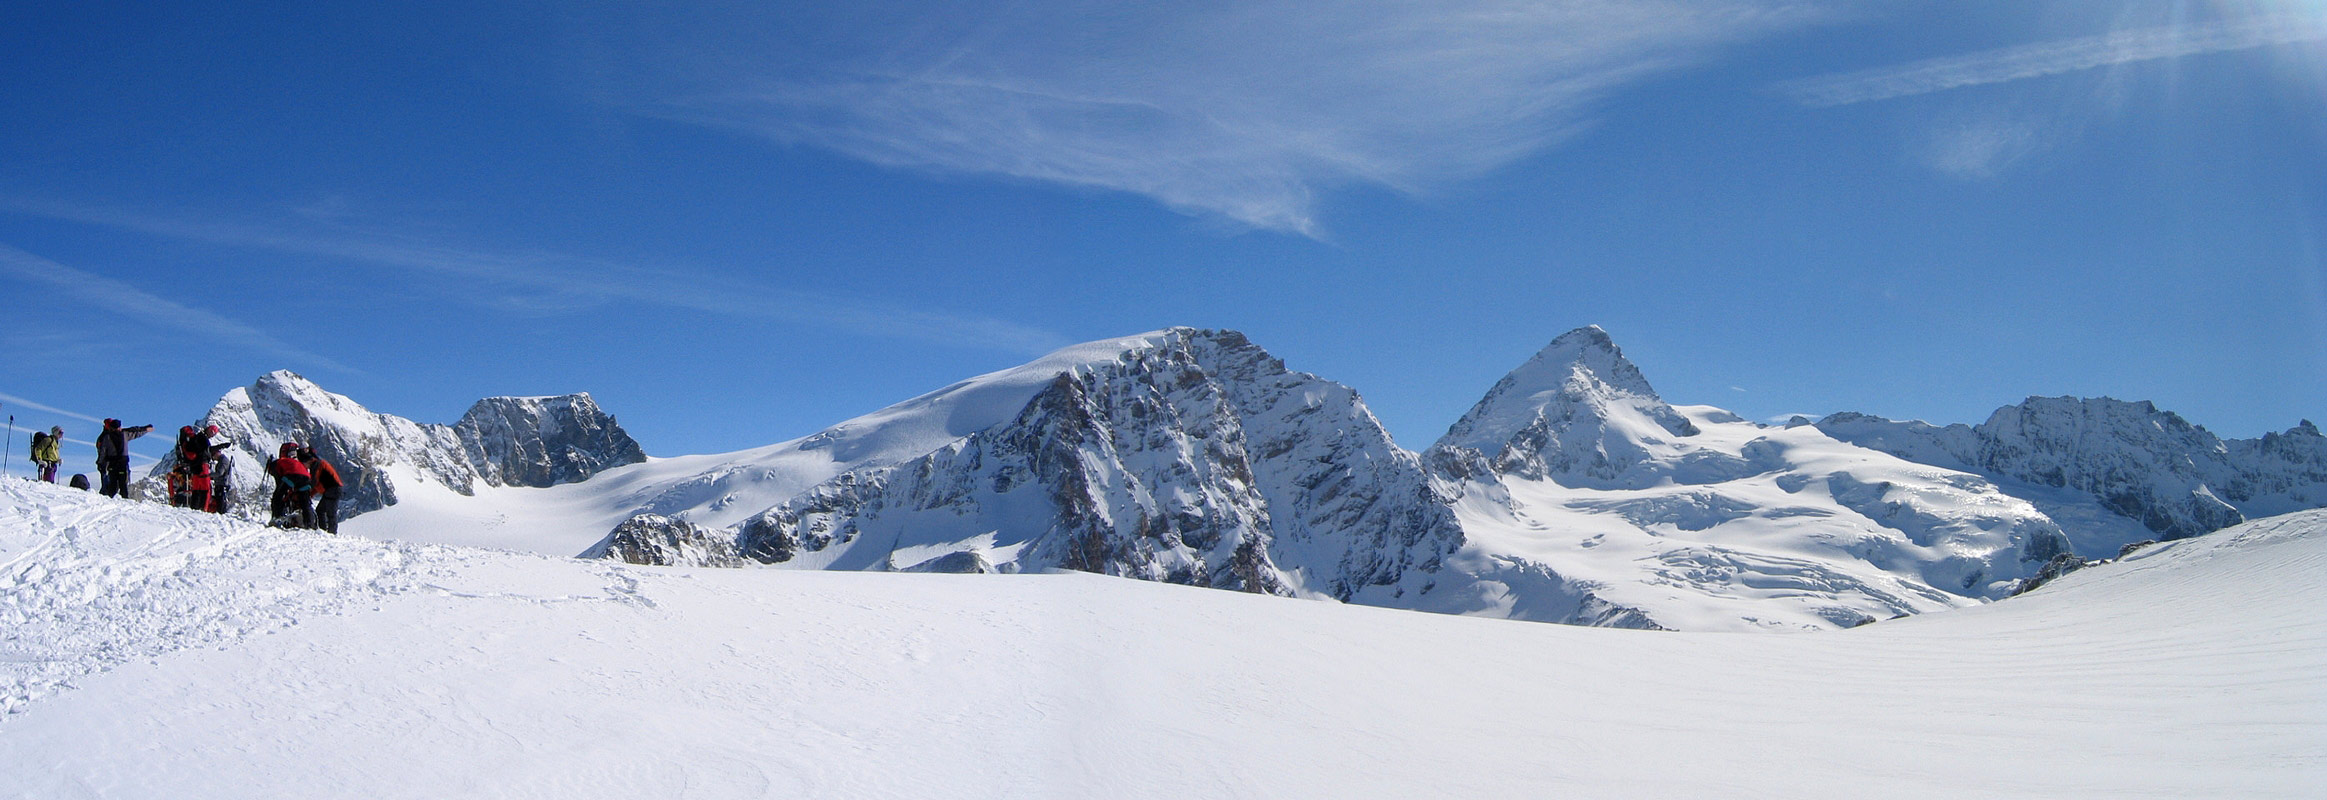 Col Valpelline, Day 6 H.R. Chamonix-Zermatt Walliser Alpen / Alpes valaisannes Švýcarsko panorama 51